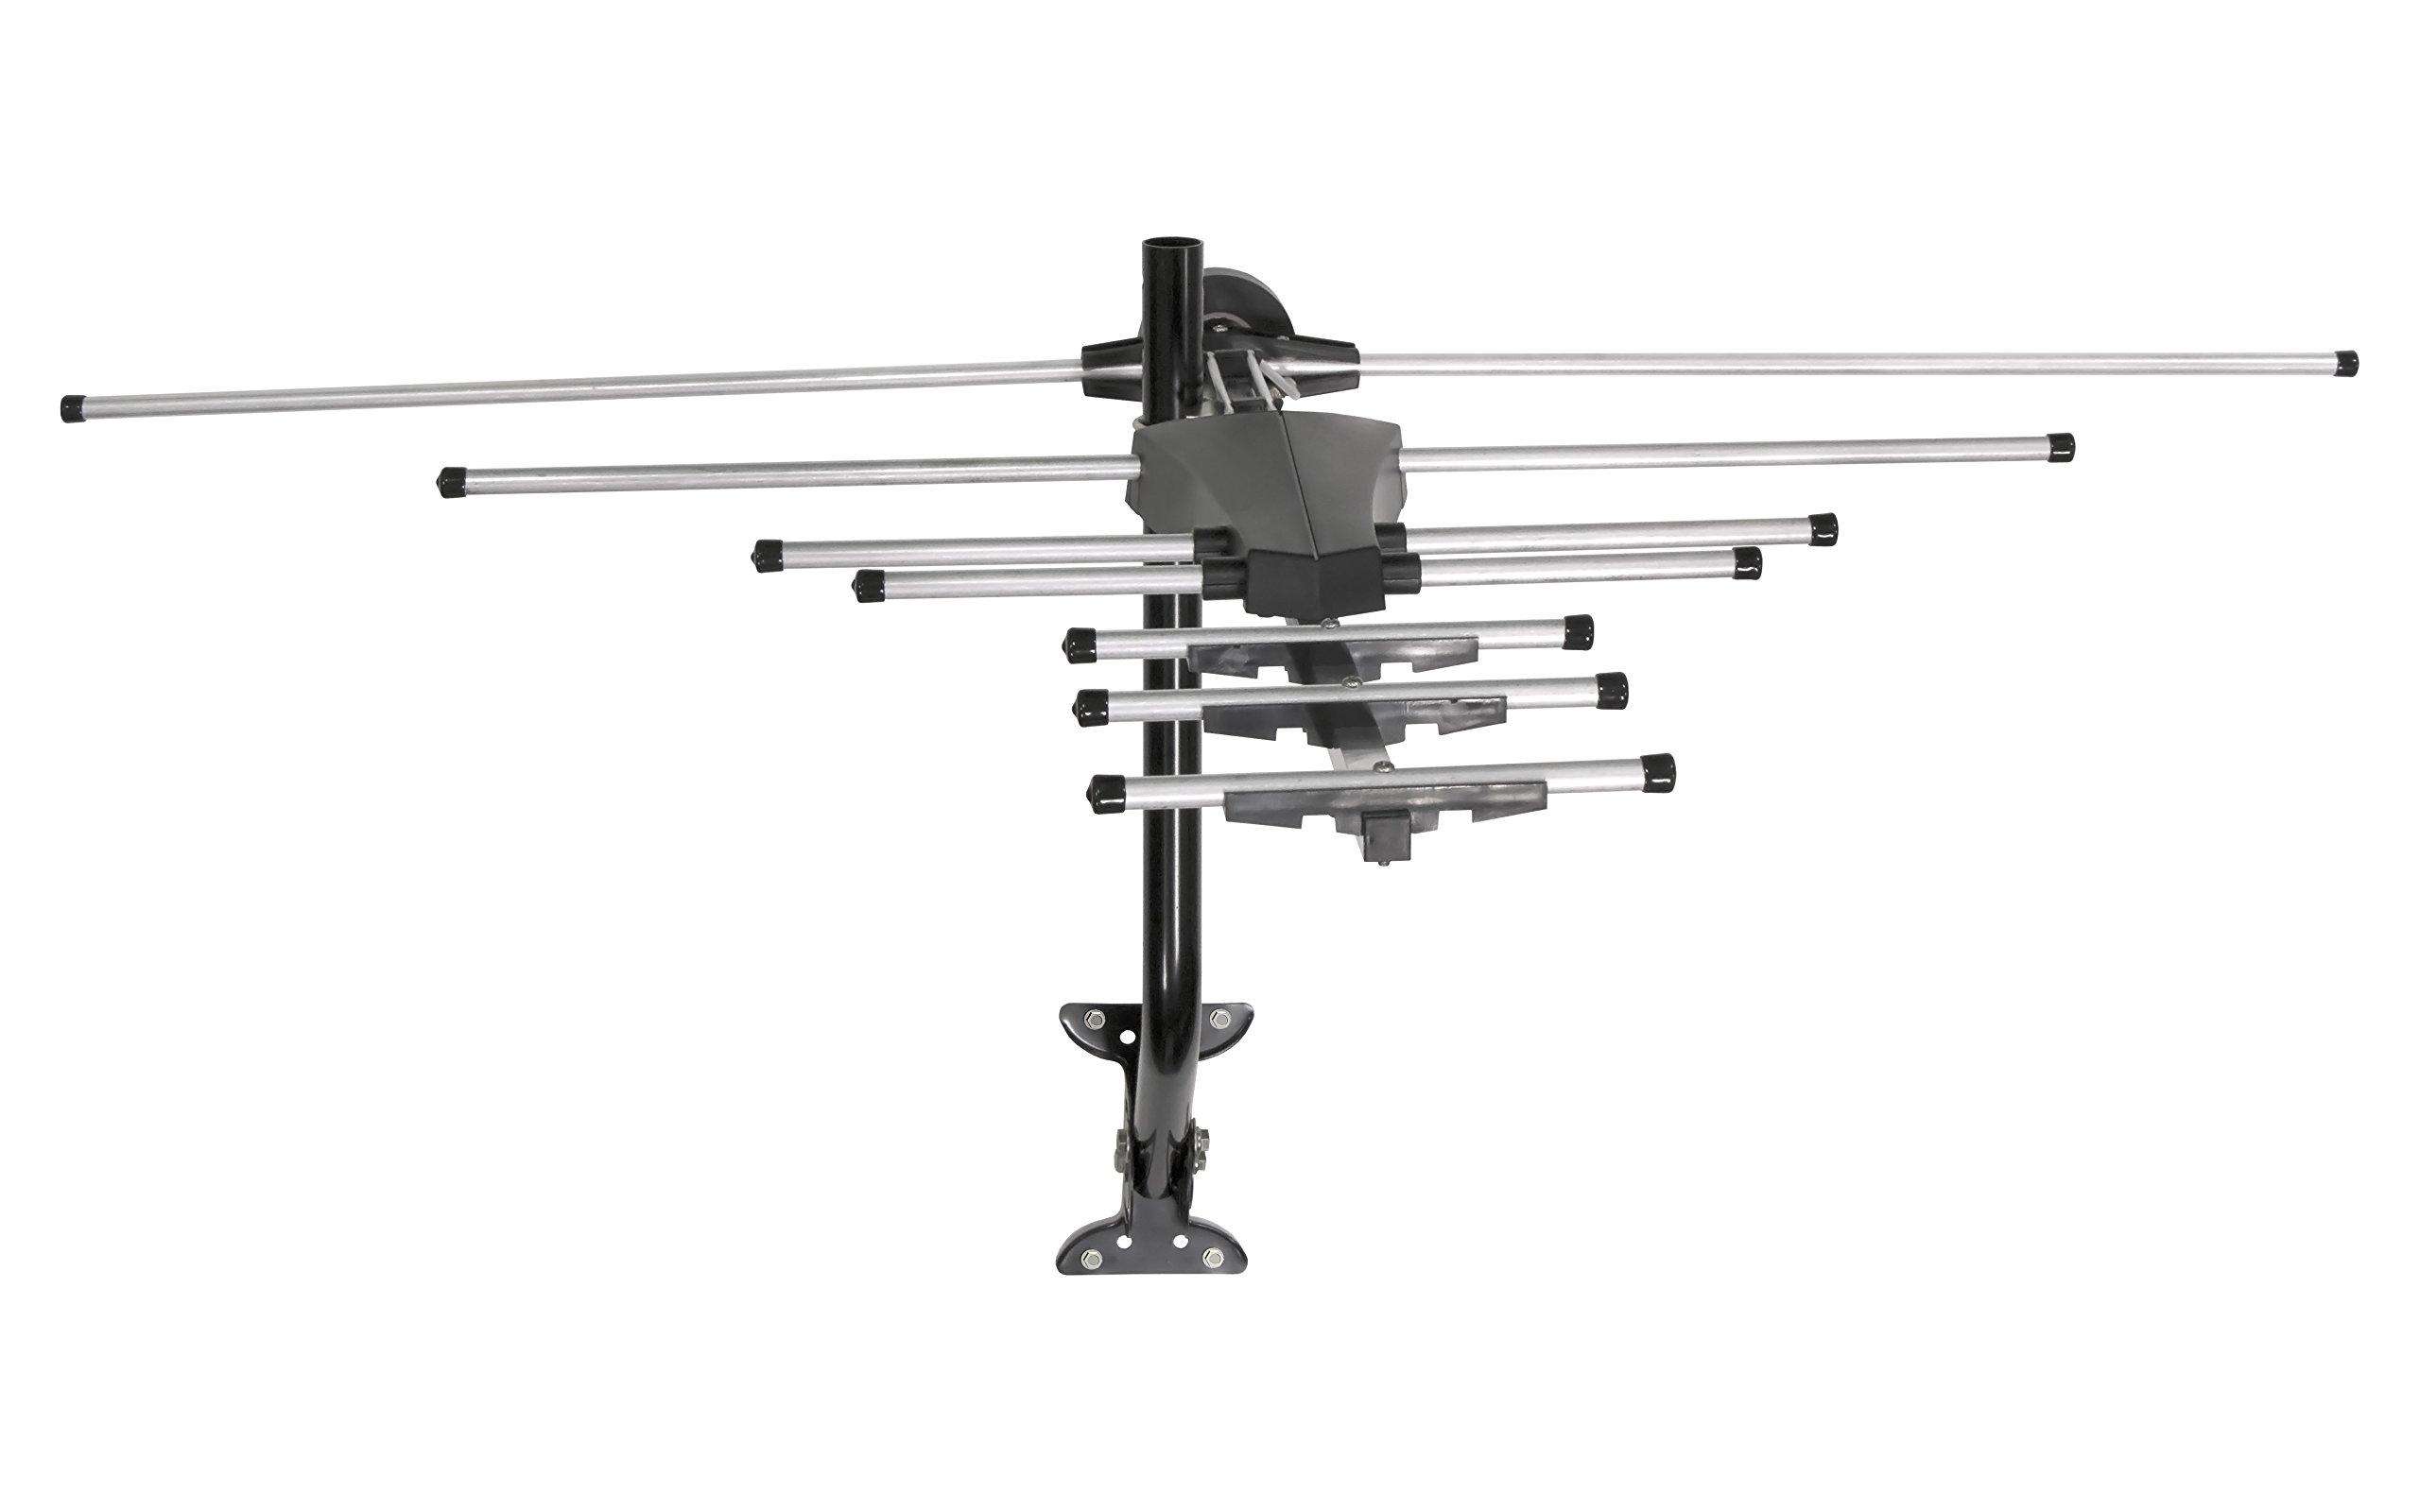 GE 33685 Pro Outdoor Yagi TV Antenna with Mount - 70 Mile Long Range HDTV Antenna - VHF/UHF Channels - Long Range - Optimized for FULLHD 1080p and 4K Ready